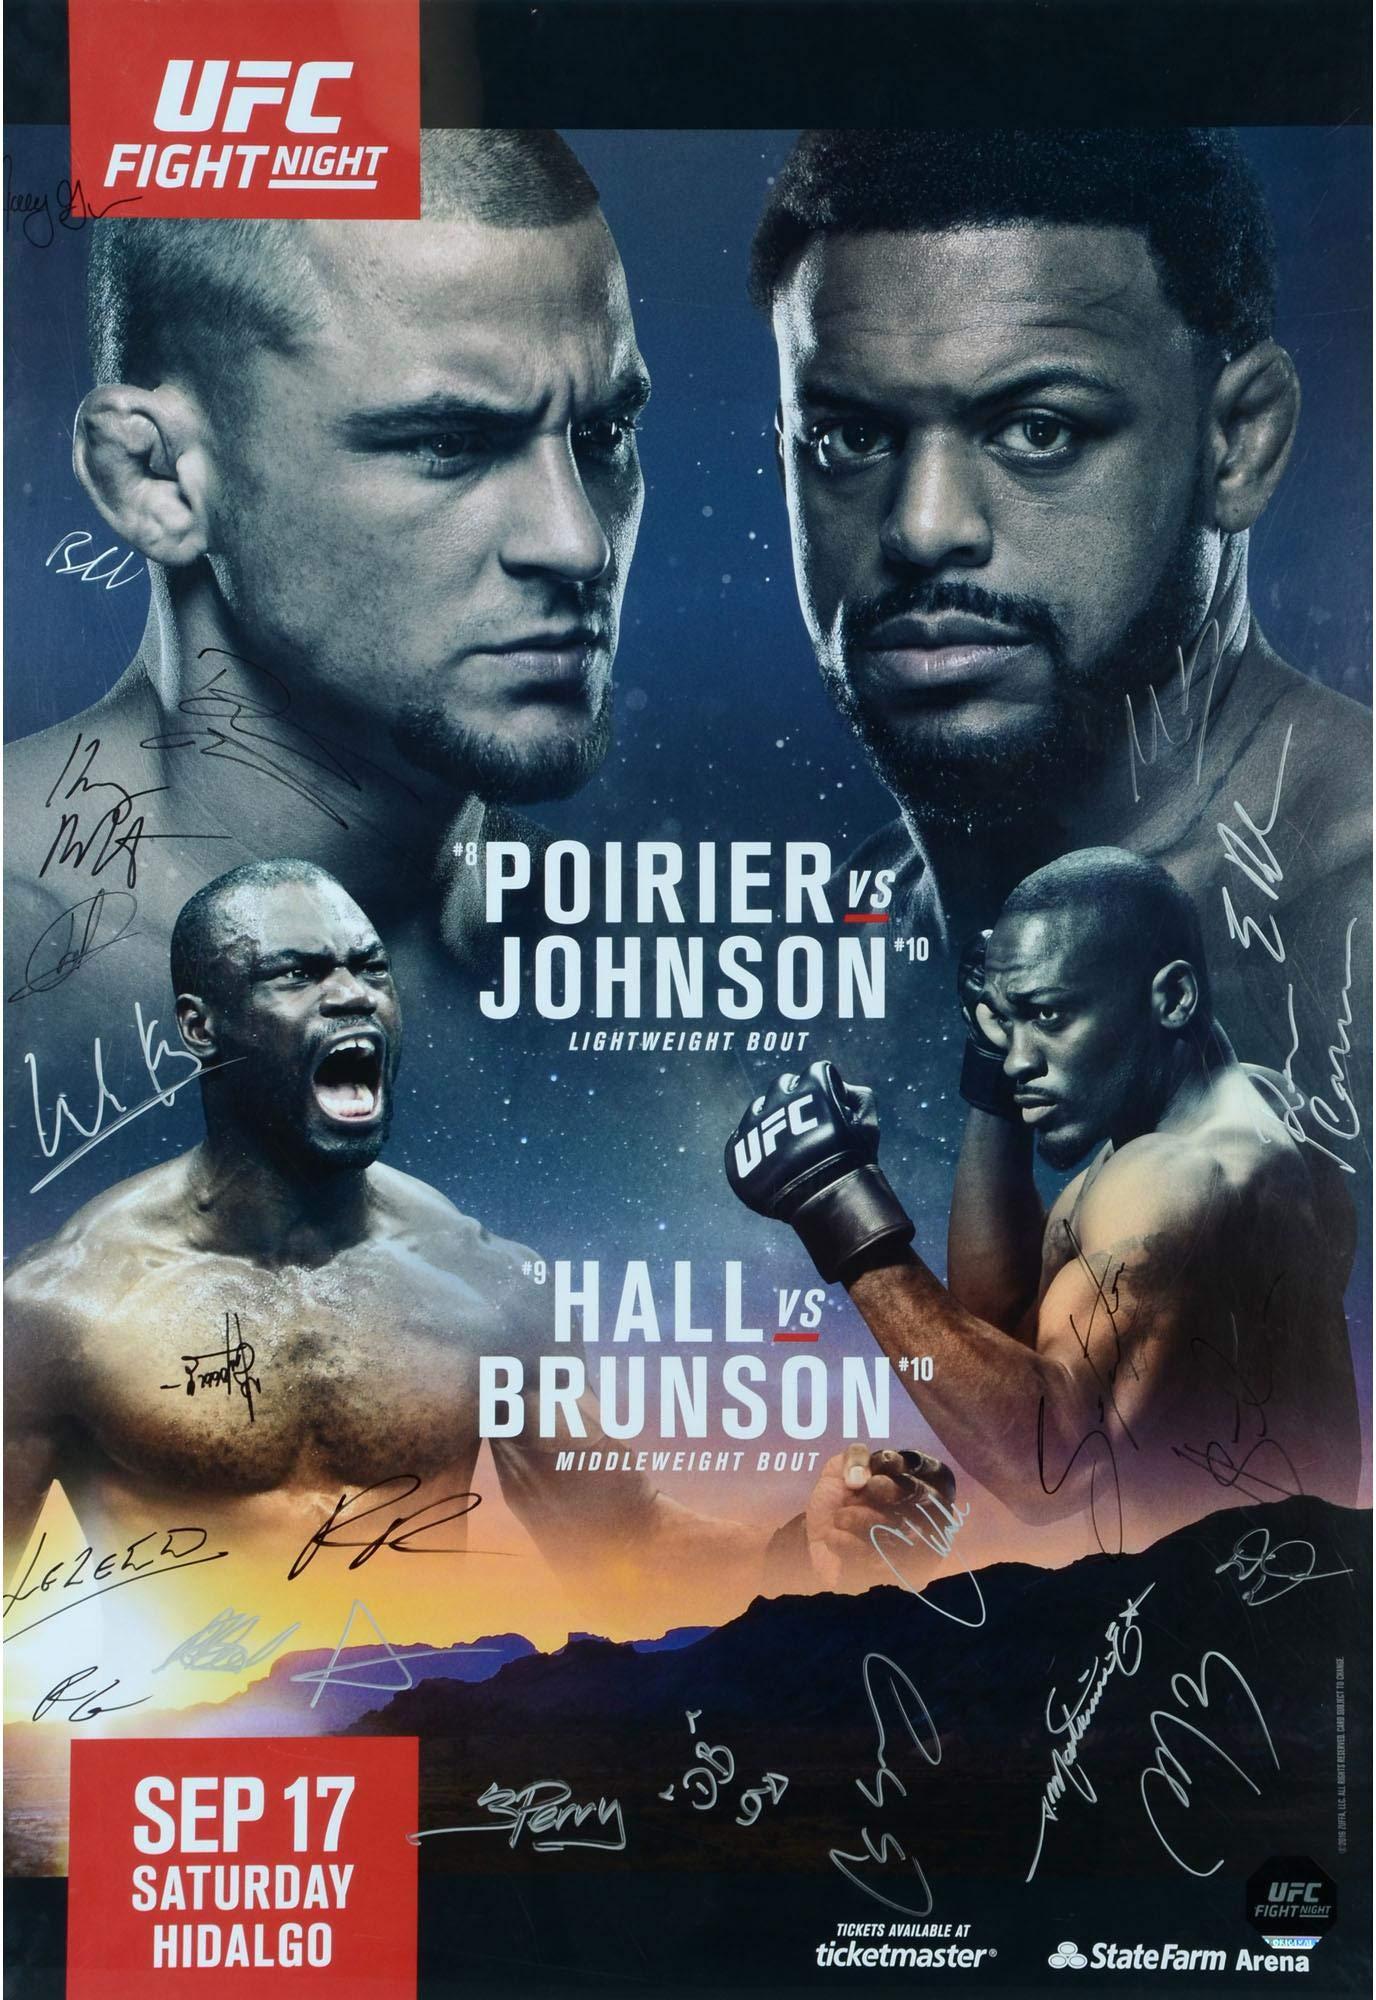 "UFC Fight Night 94 Poirier vs. Johnson Autographed 27"" x 39"" 24 Signature Fight Poster Fanatics Authentic Certified"